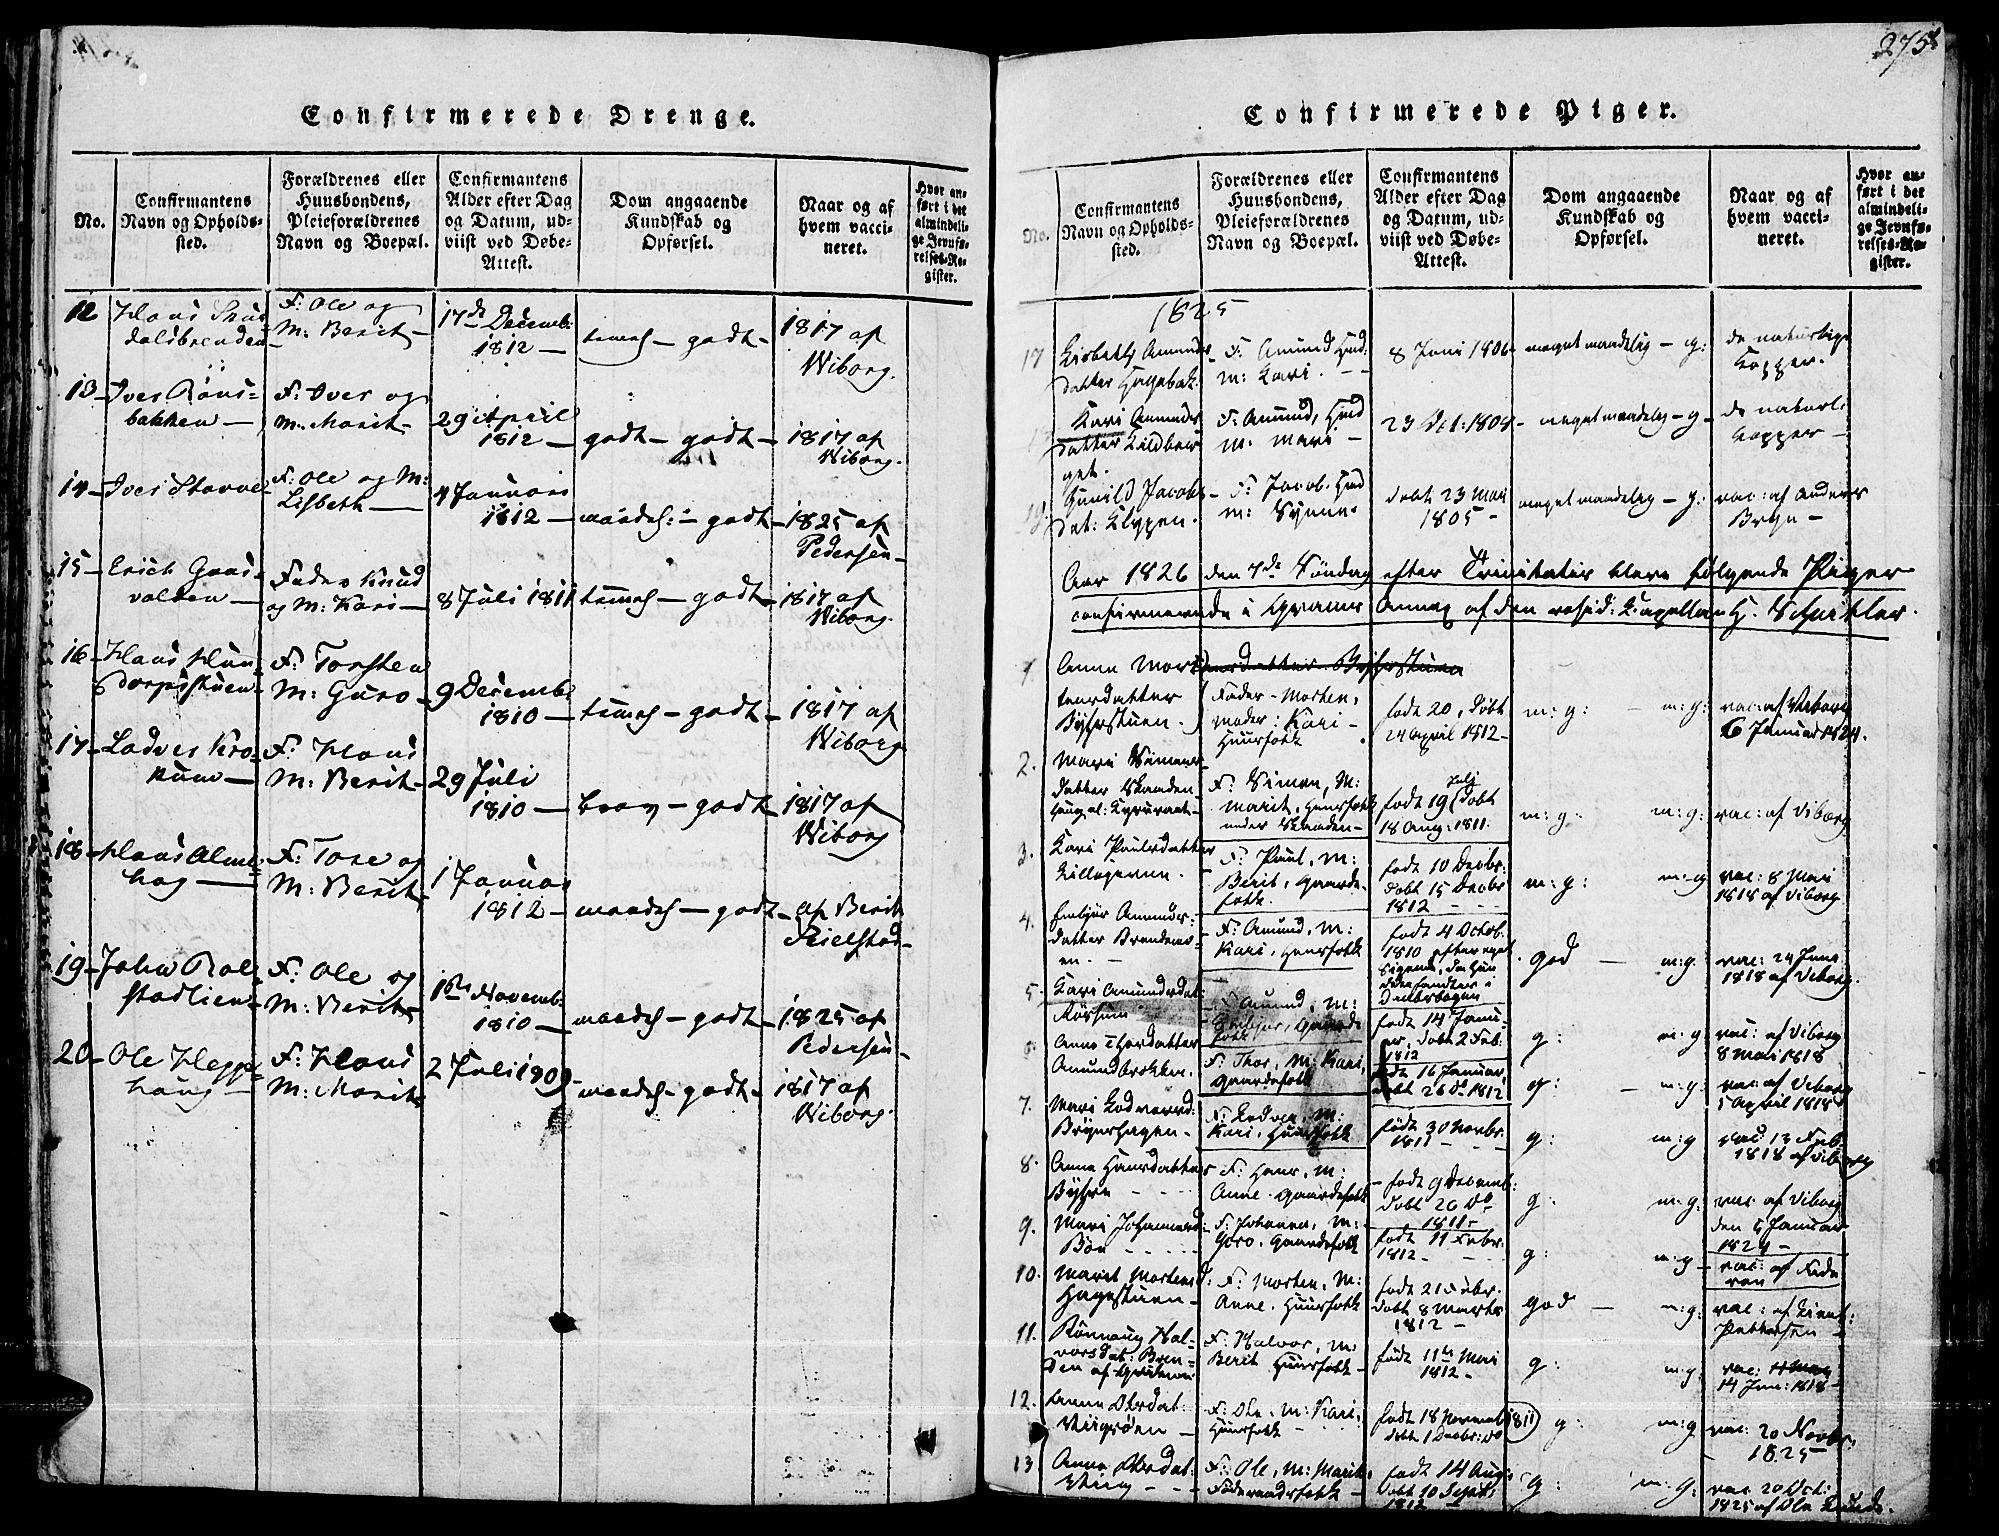 SAH, Fron prestekontor, H/Ha/Haa/L0002: Ministerialbok nr. 2, 1816-1827, s. 275